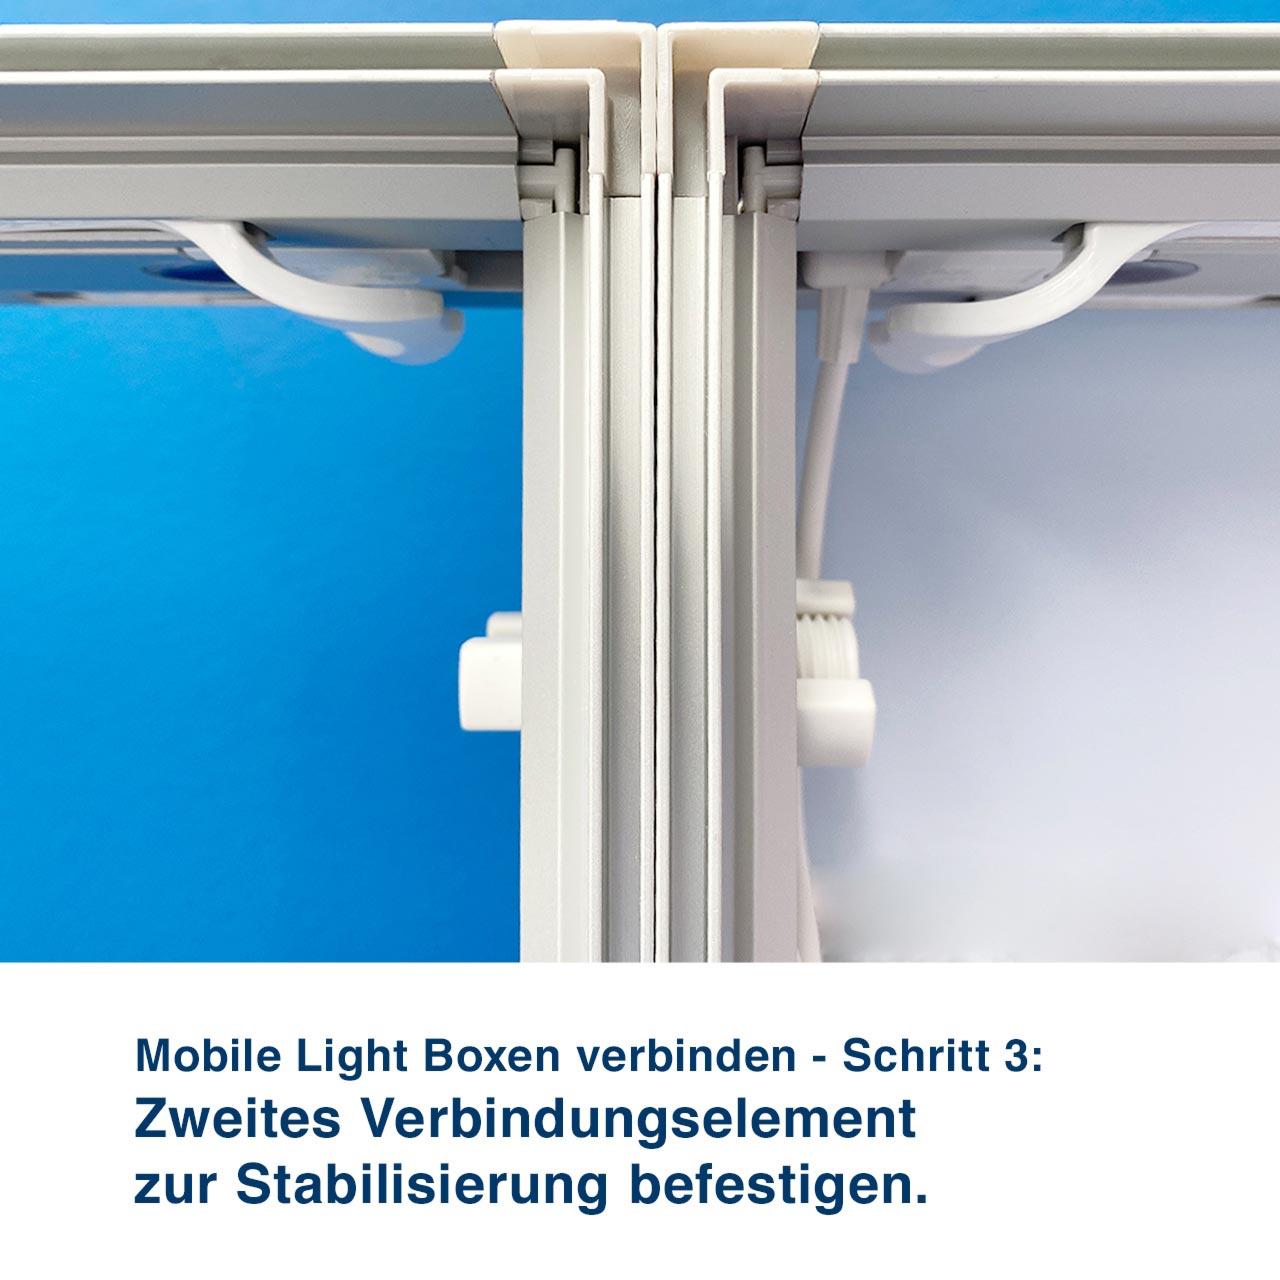 Mobile Light Boxen verbinden - Schritt 3:  Zweites Verbindungselement zur Stabilisierung befestigen.